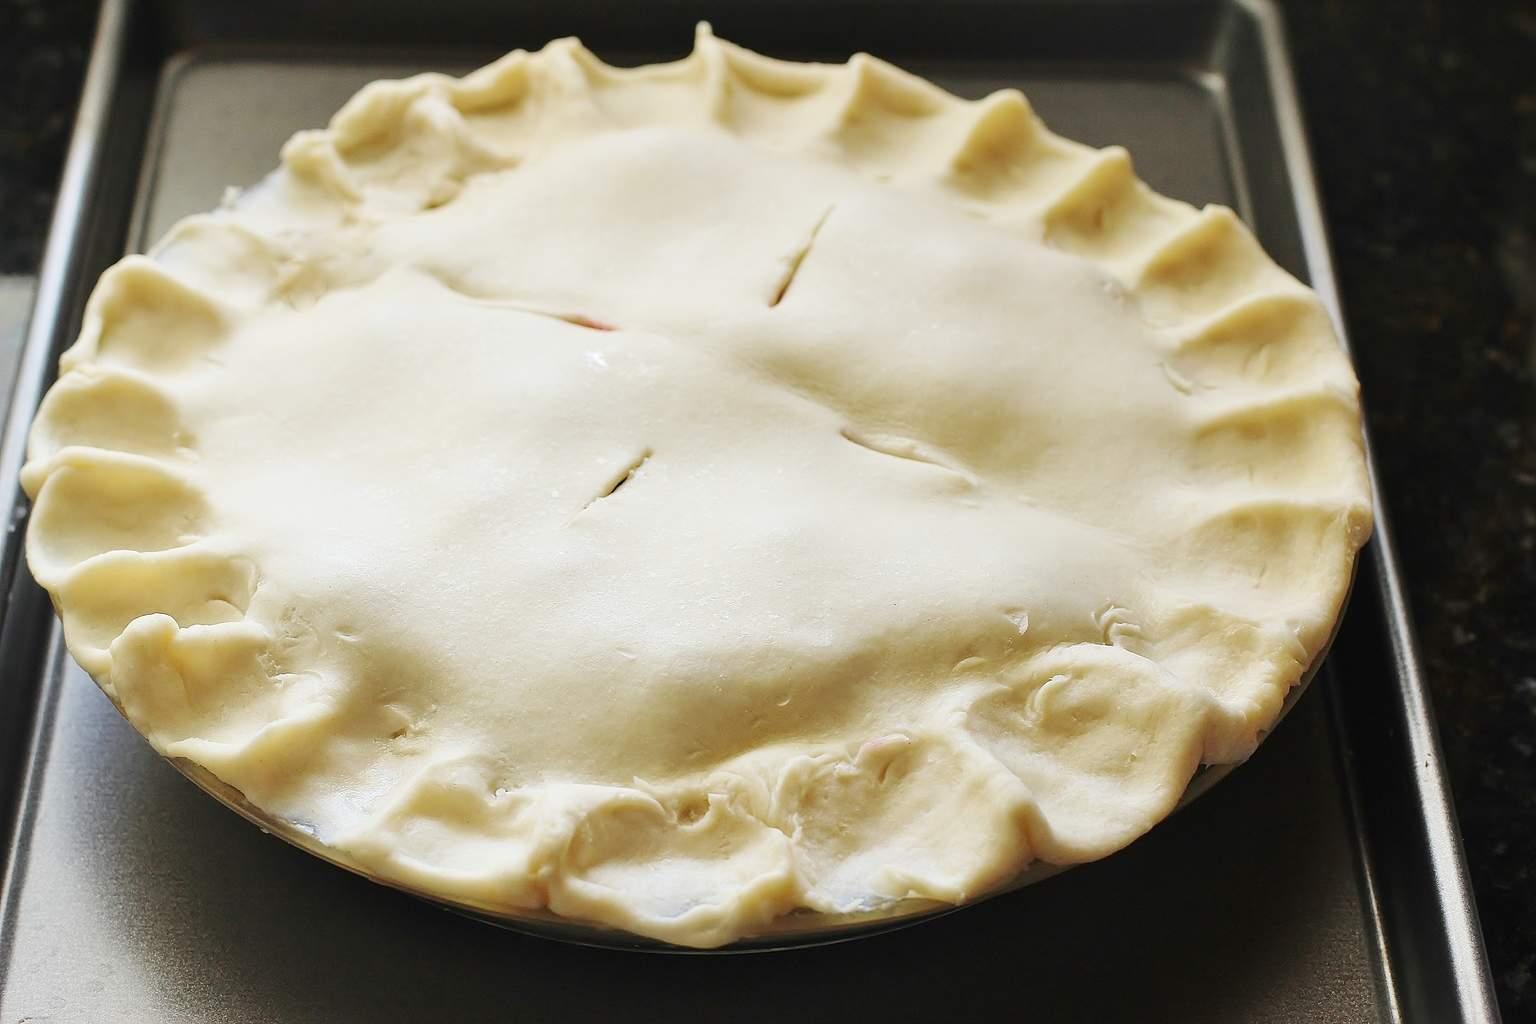 Double-crust Butter Pie Crust